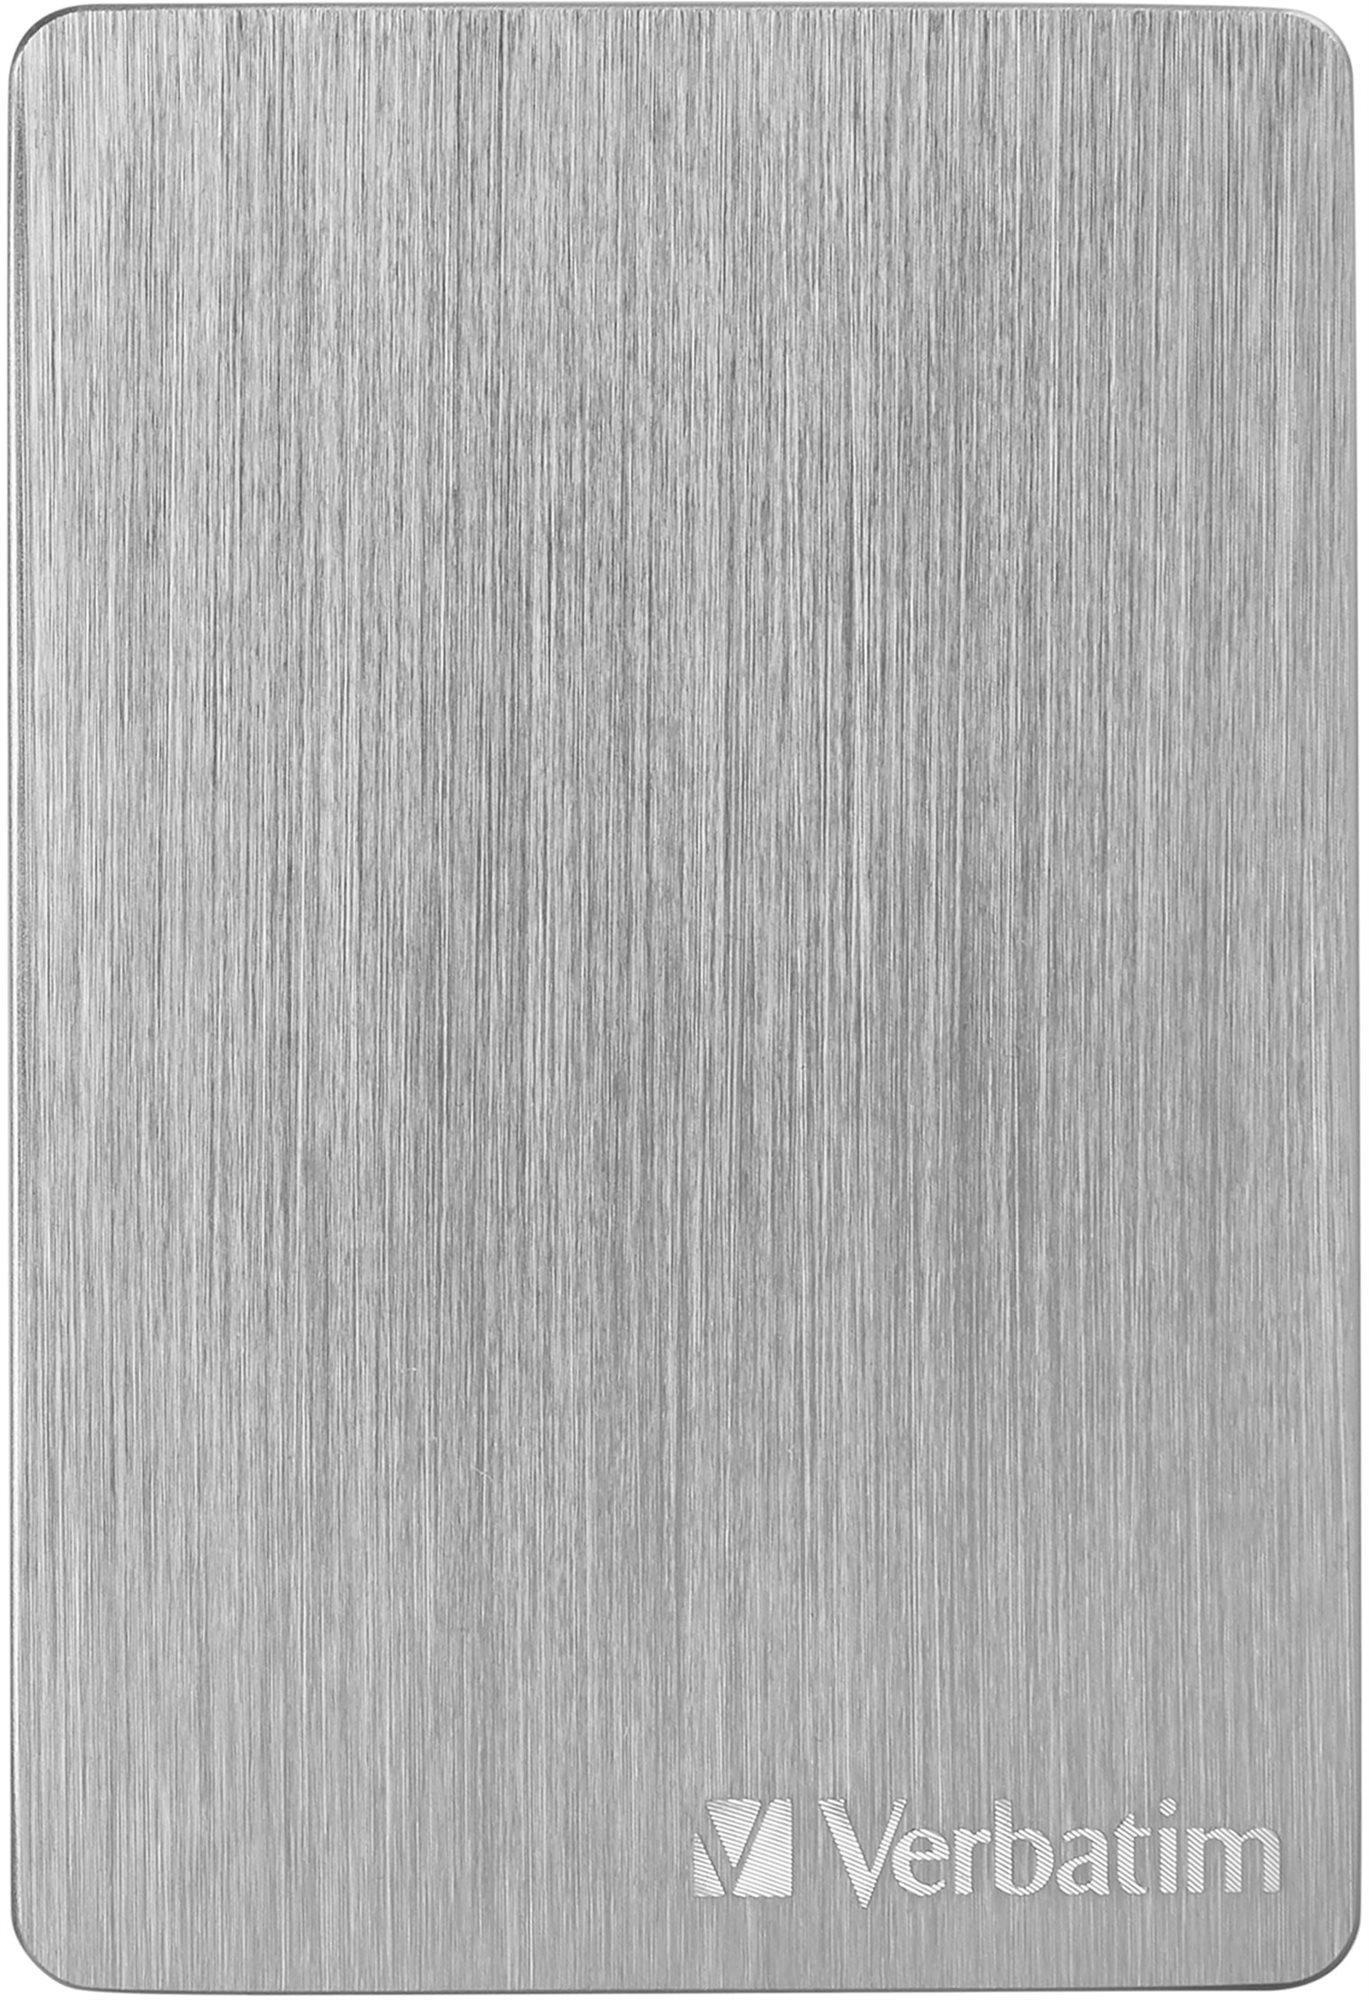 VERBATIM Store´n´ Go ALU Slim 1TB, ezüst